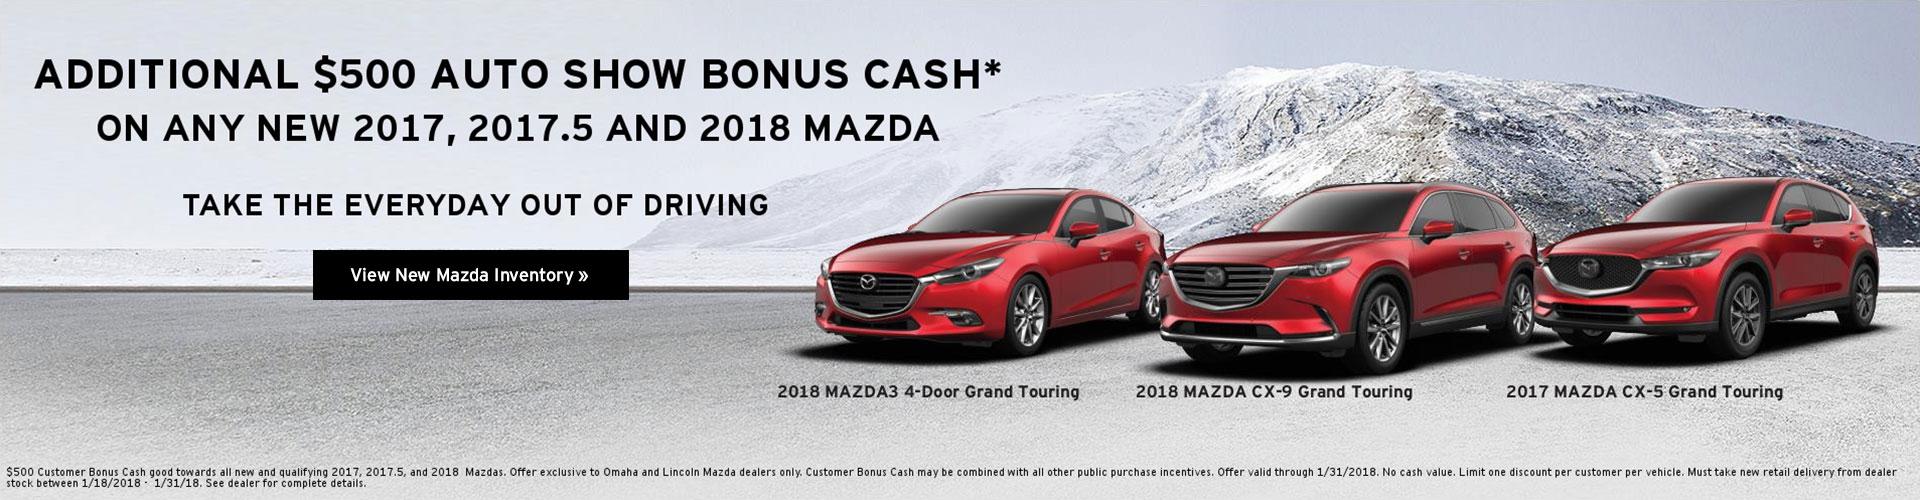 Midlands International Auto Show 0 Customer Bonus Cash